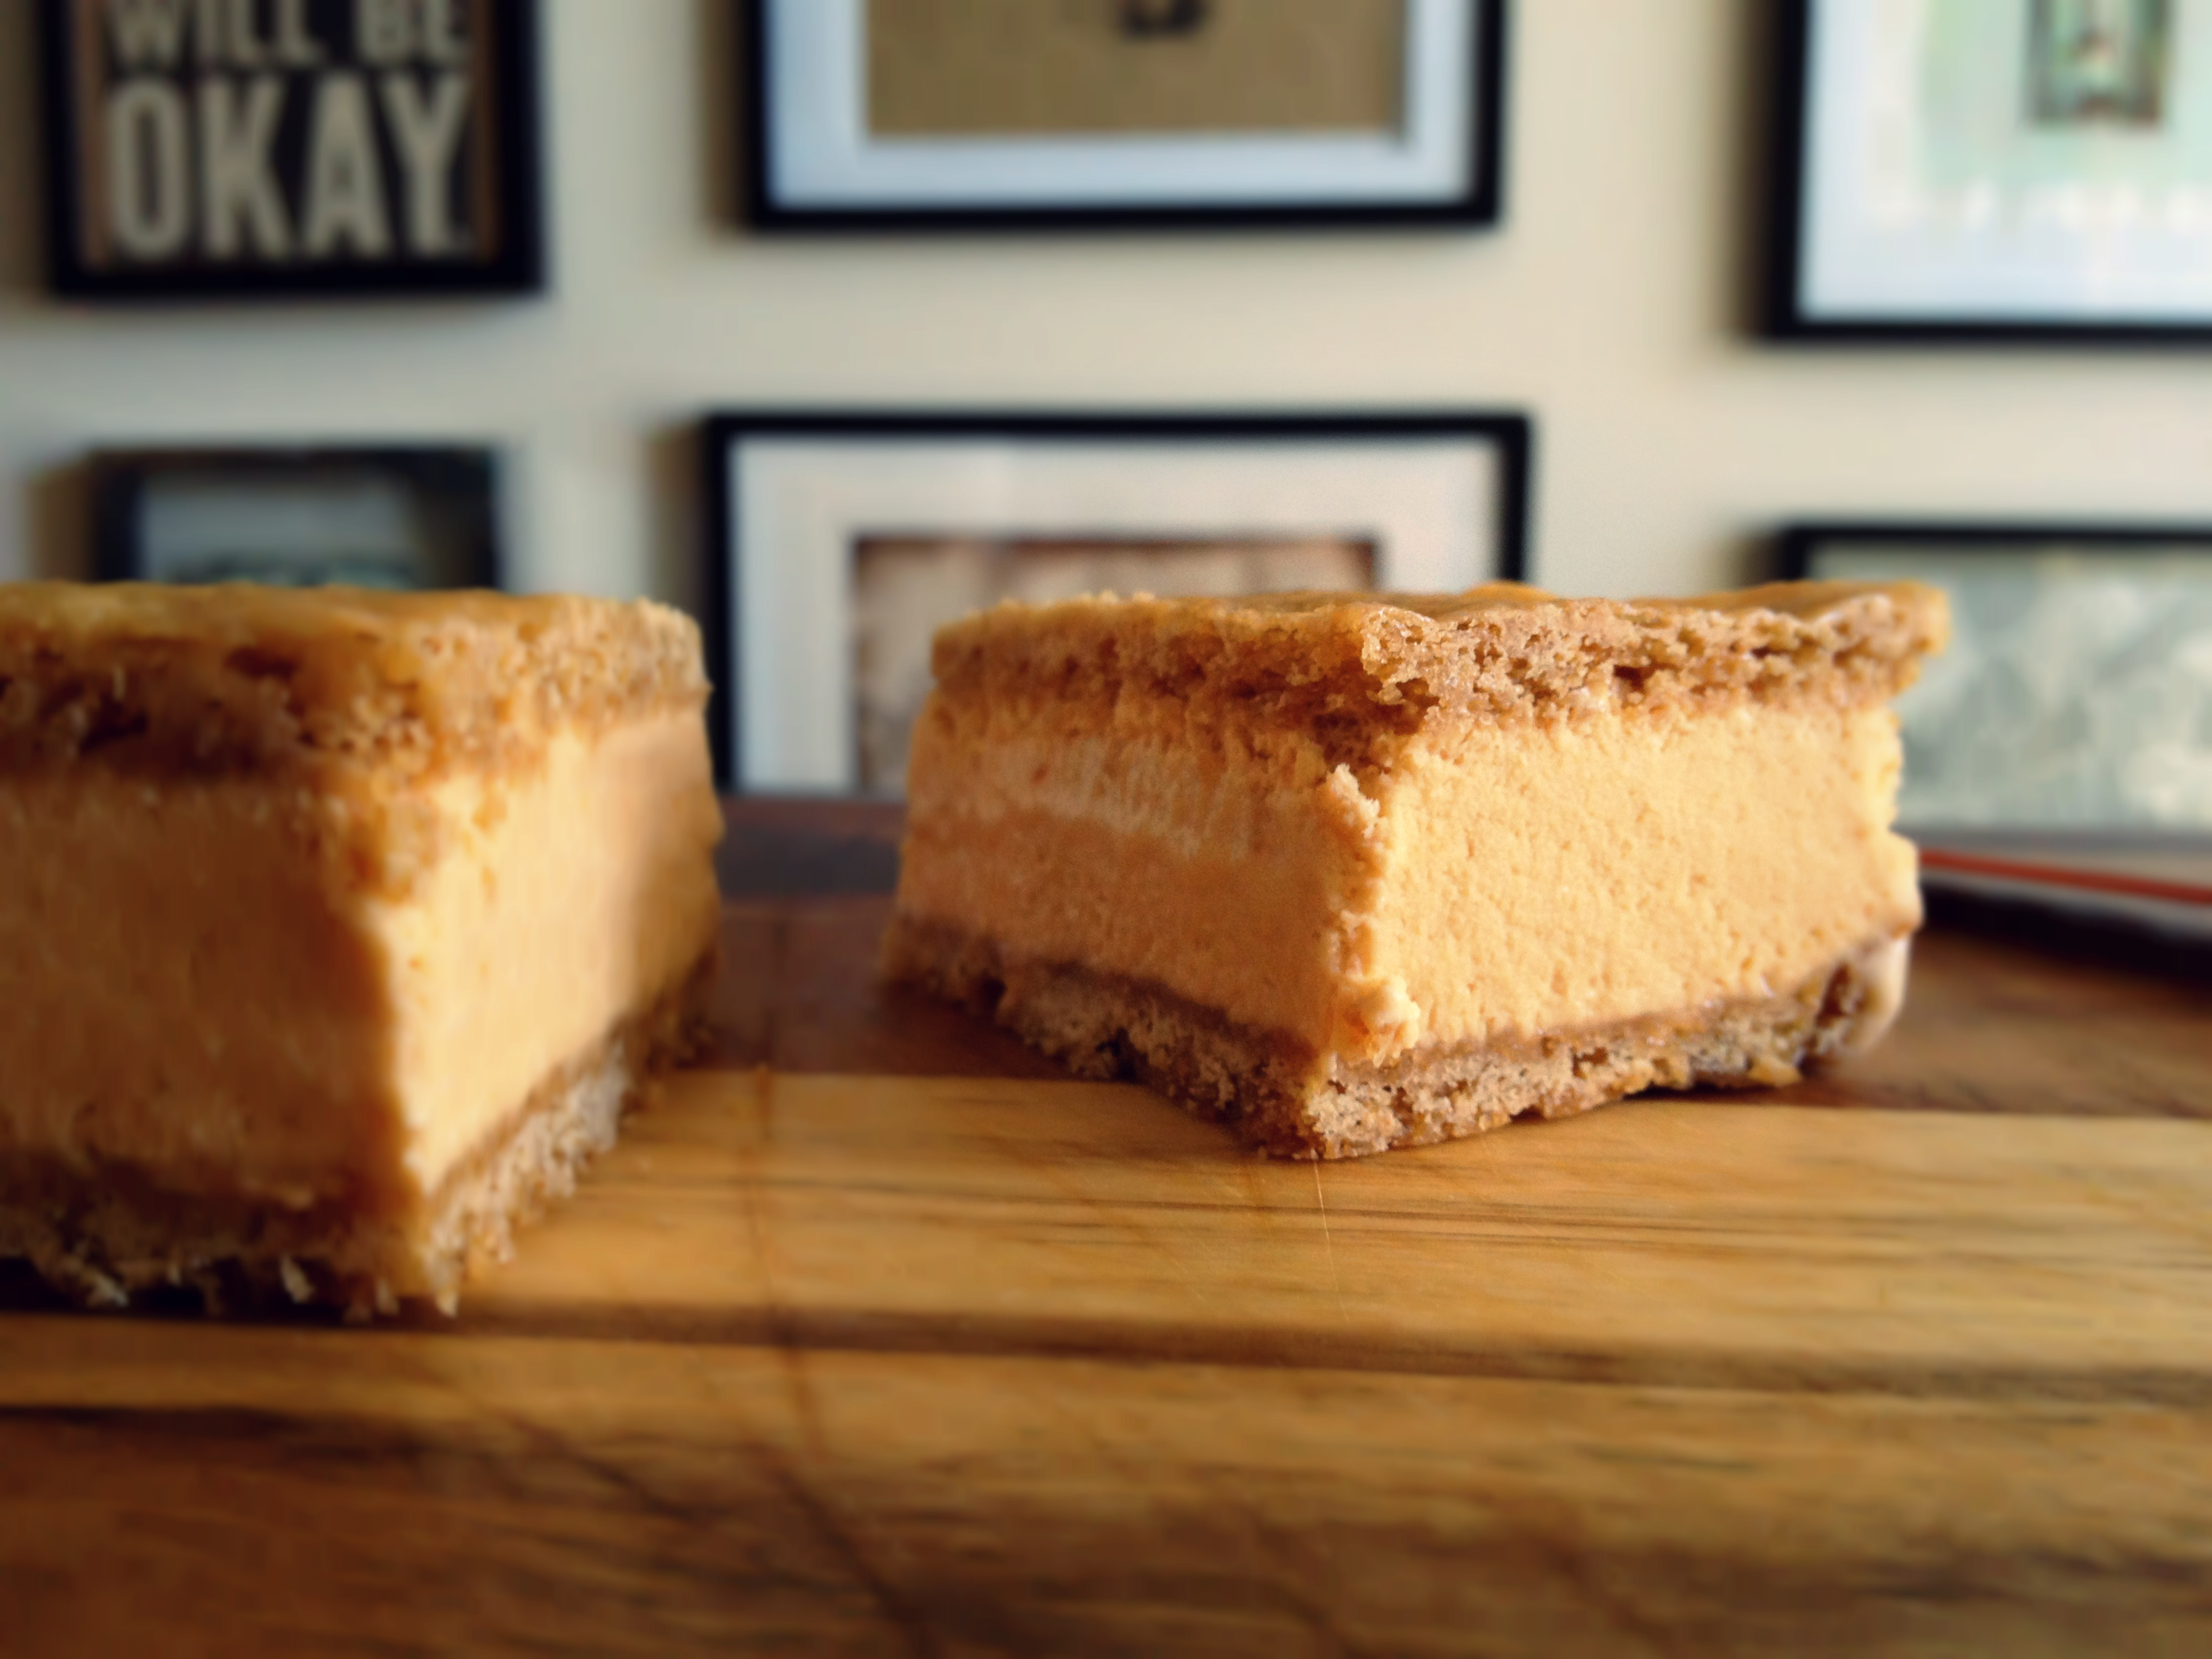 Brown Butter Sea Salt Caramel Ice Cream Sandwiches